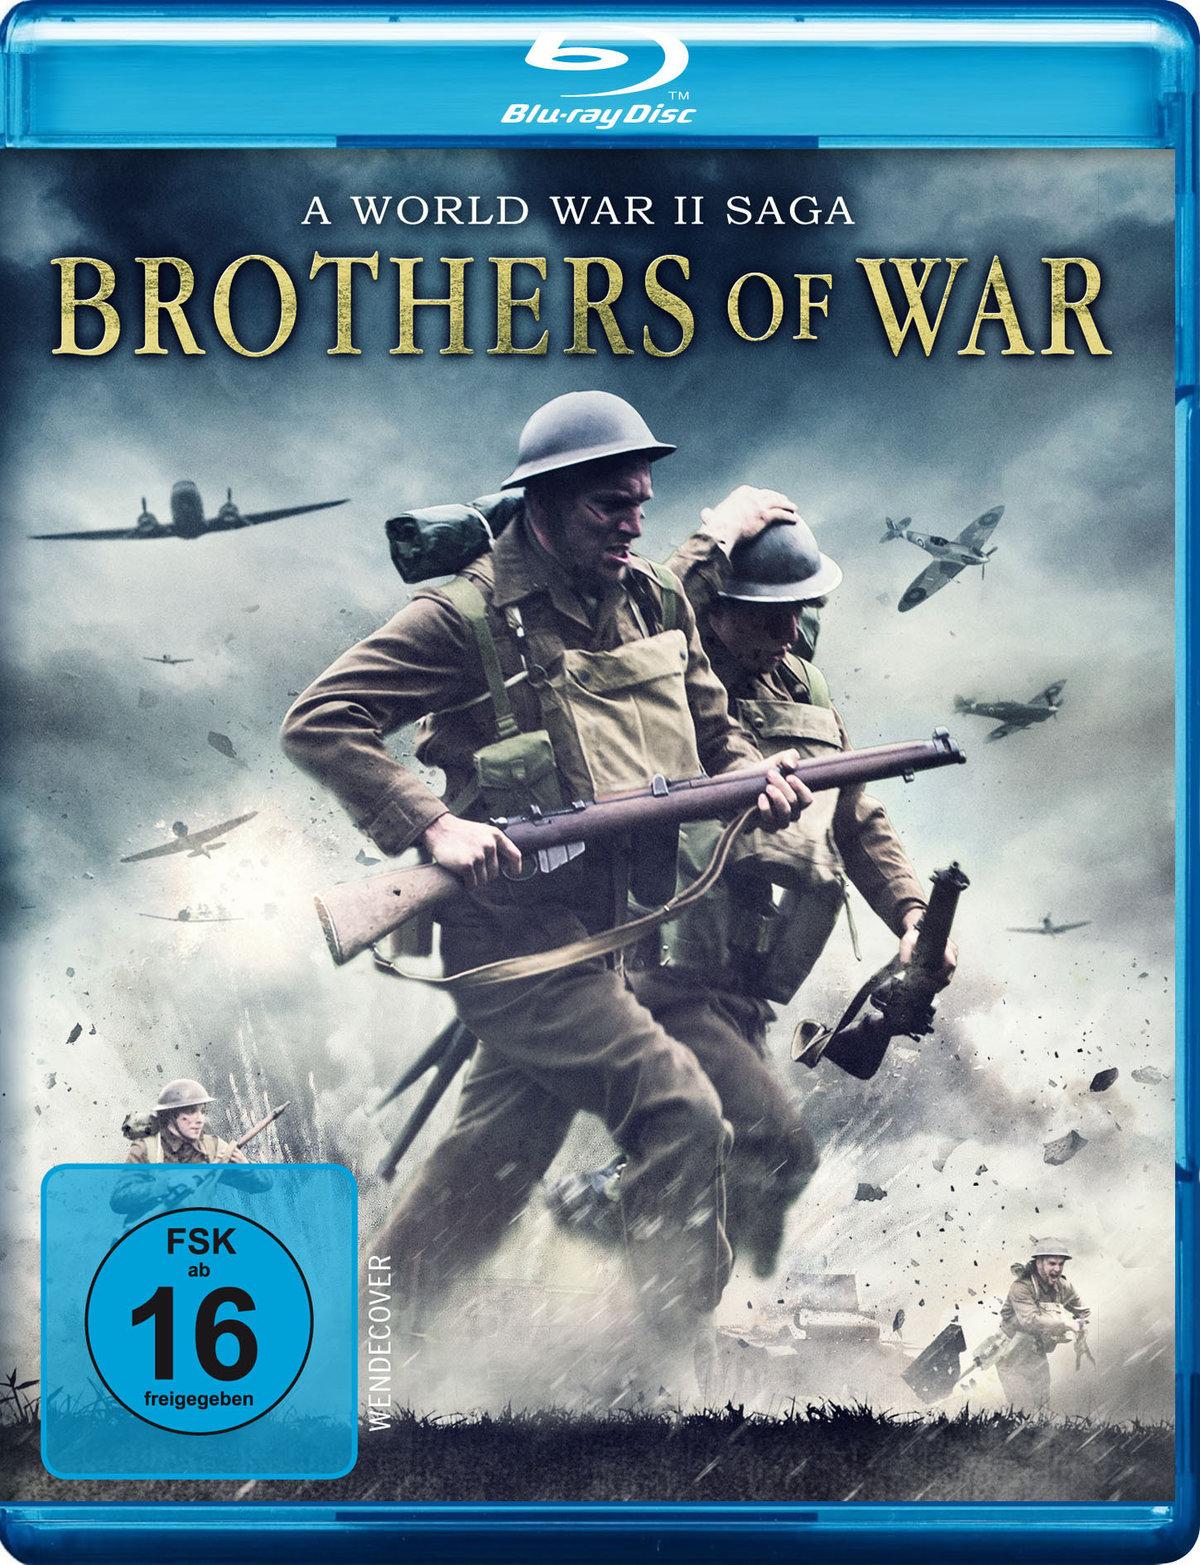 Brothers of War (2014) - A World War II Saga